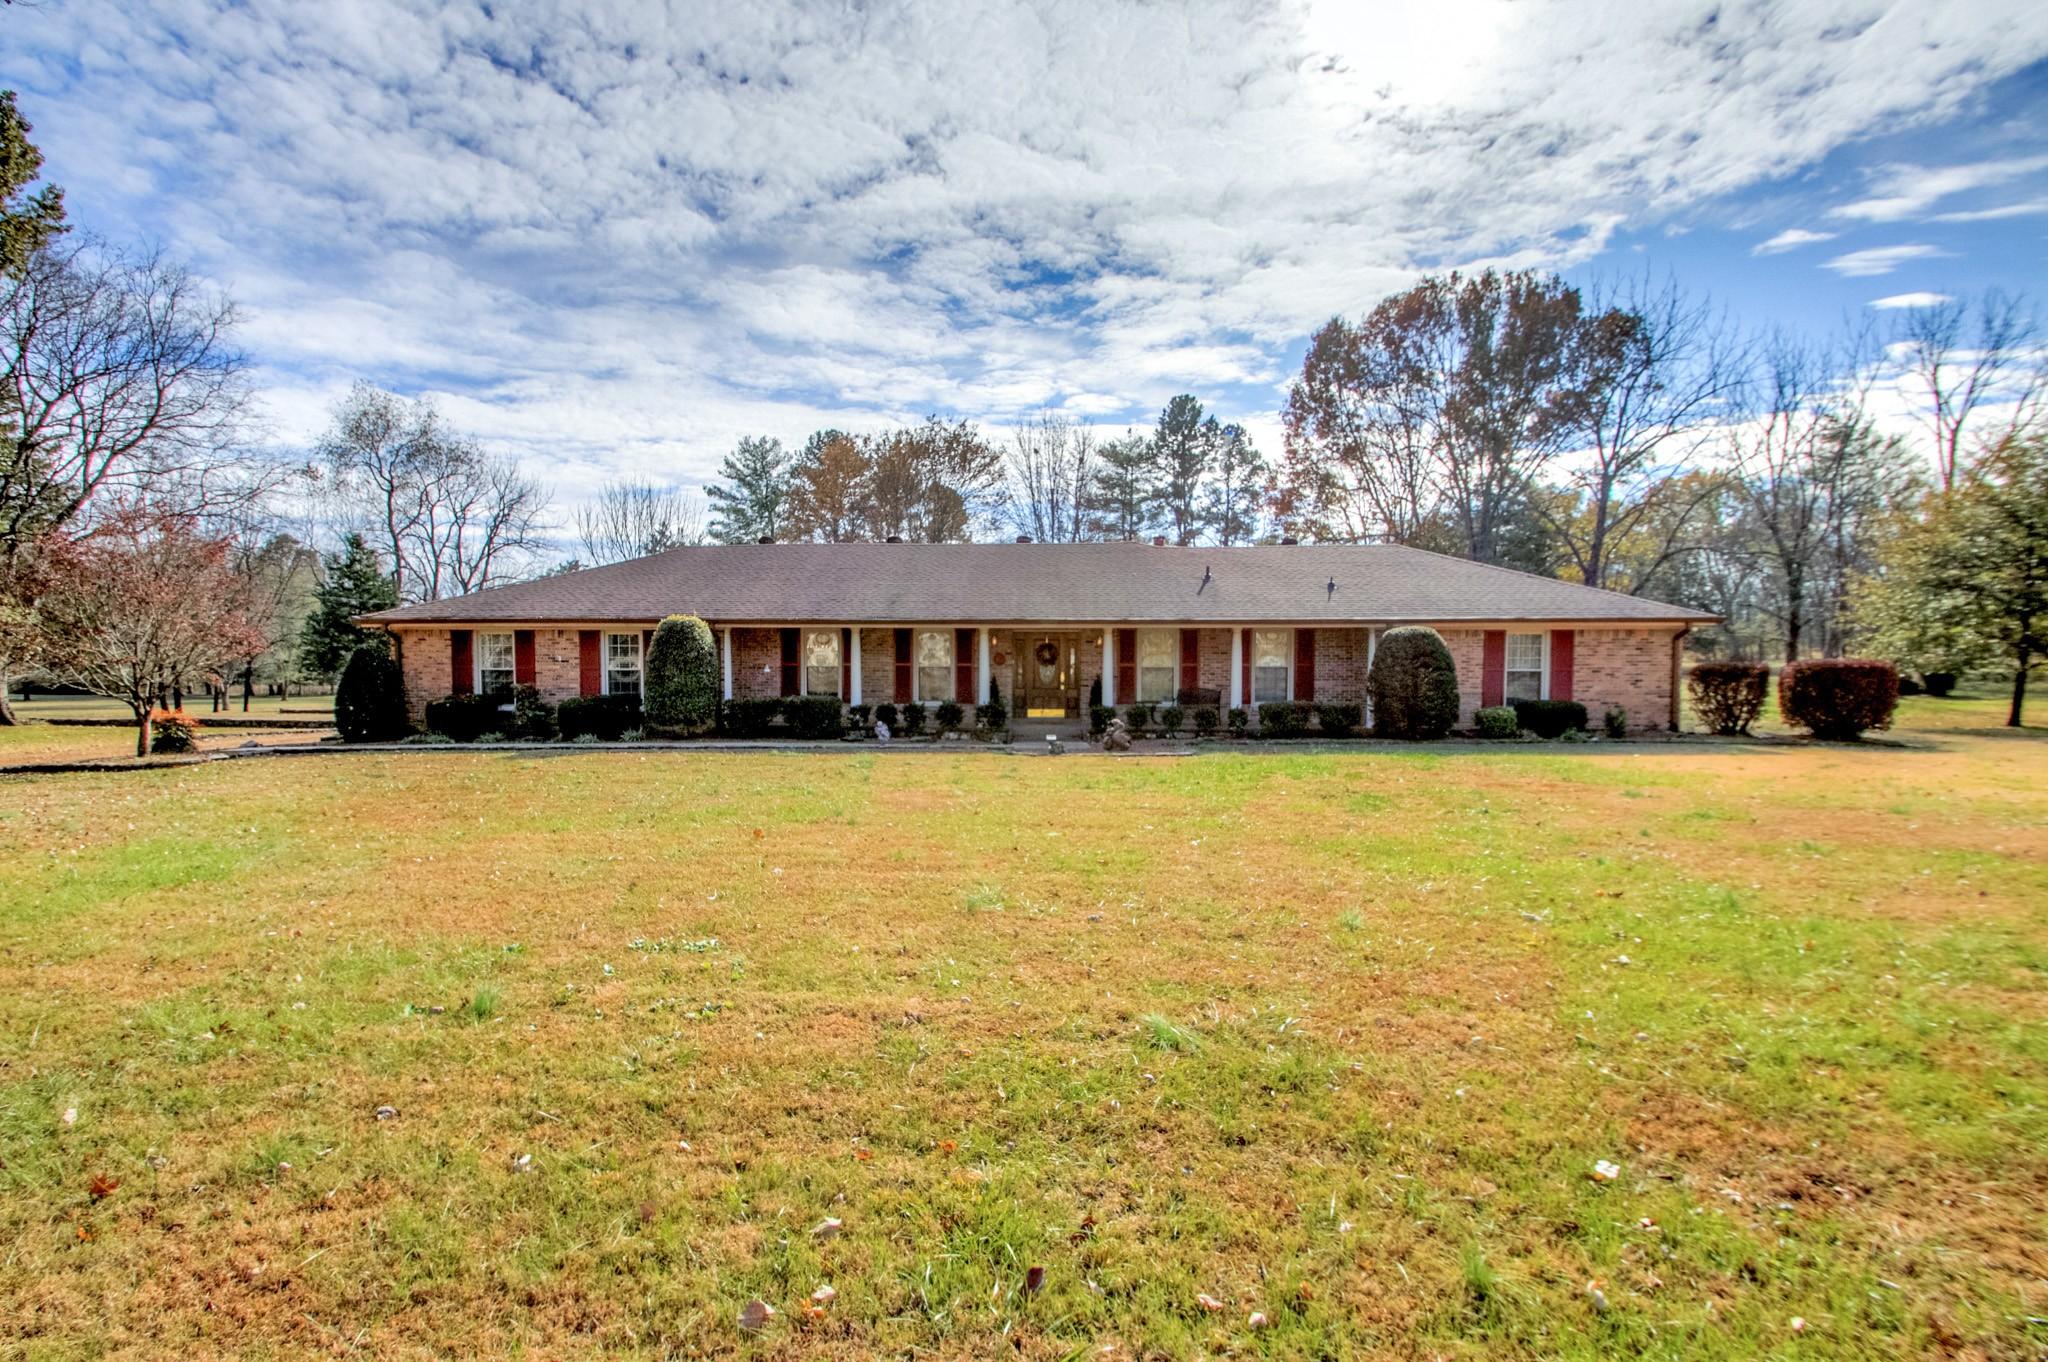 134 Bluegrass Pkwy, Lebanon, TN 37090 - Lebanon, TN real estate listing